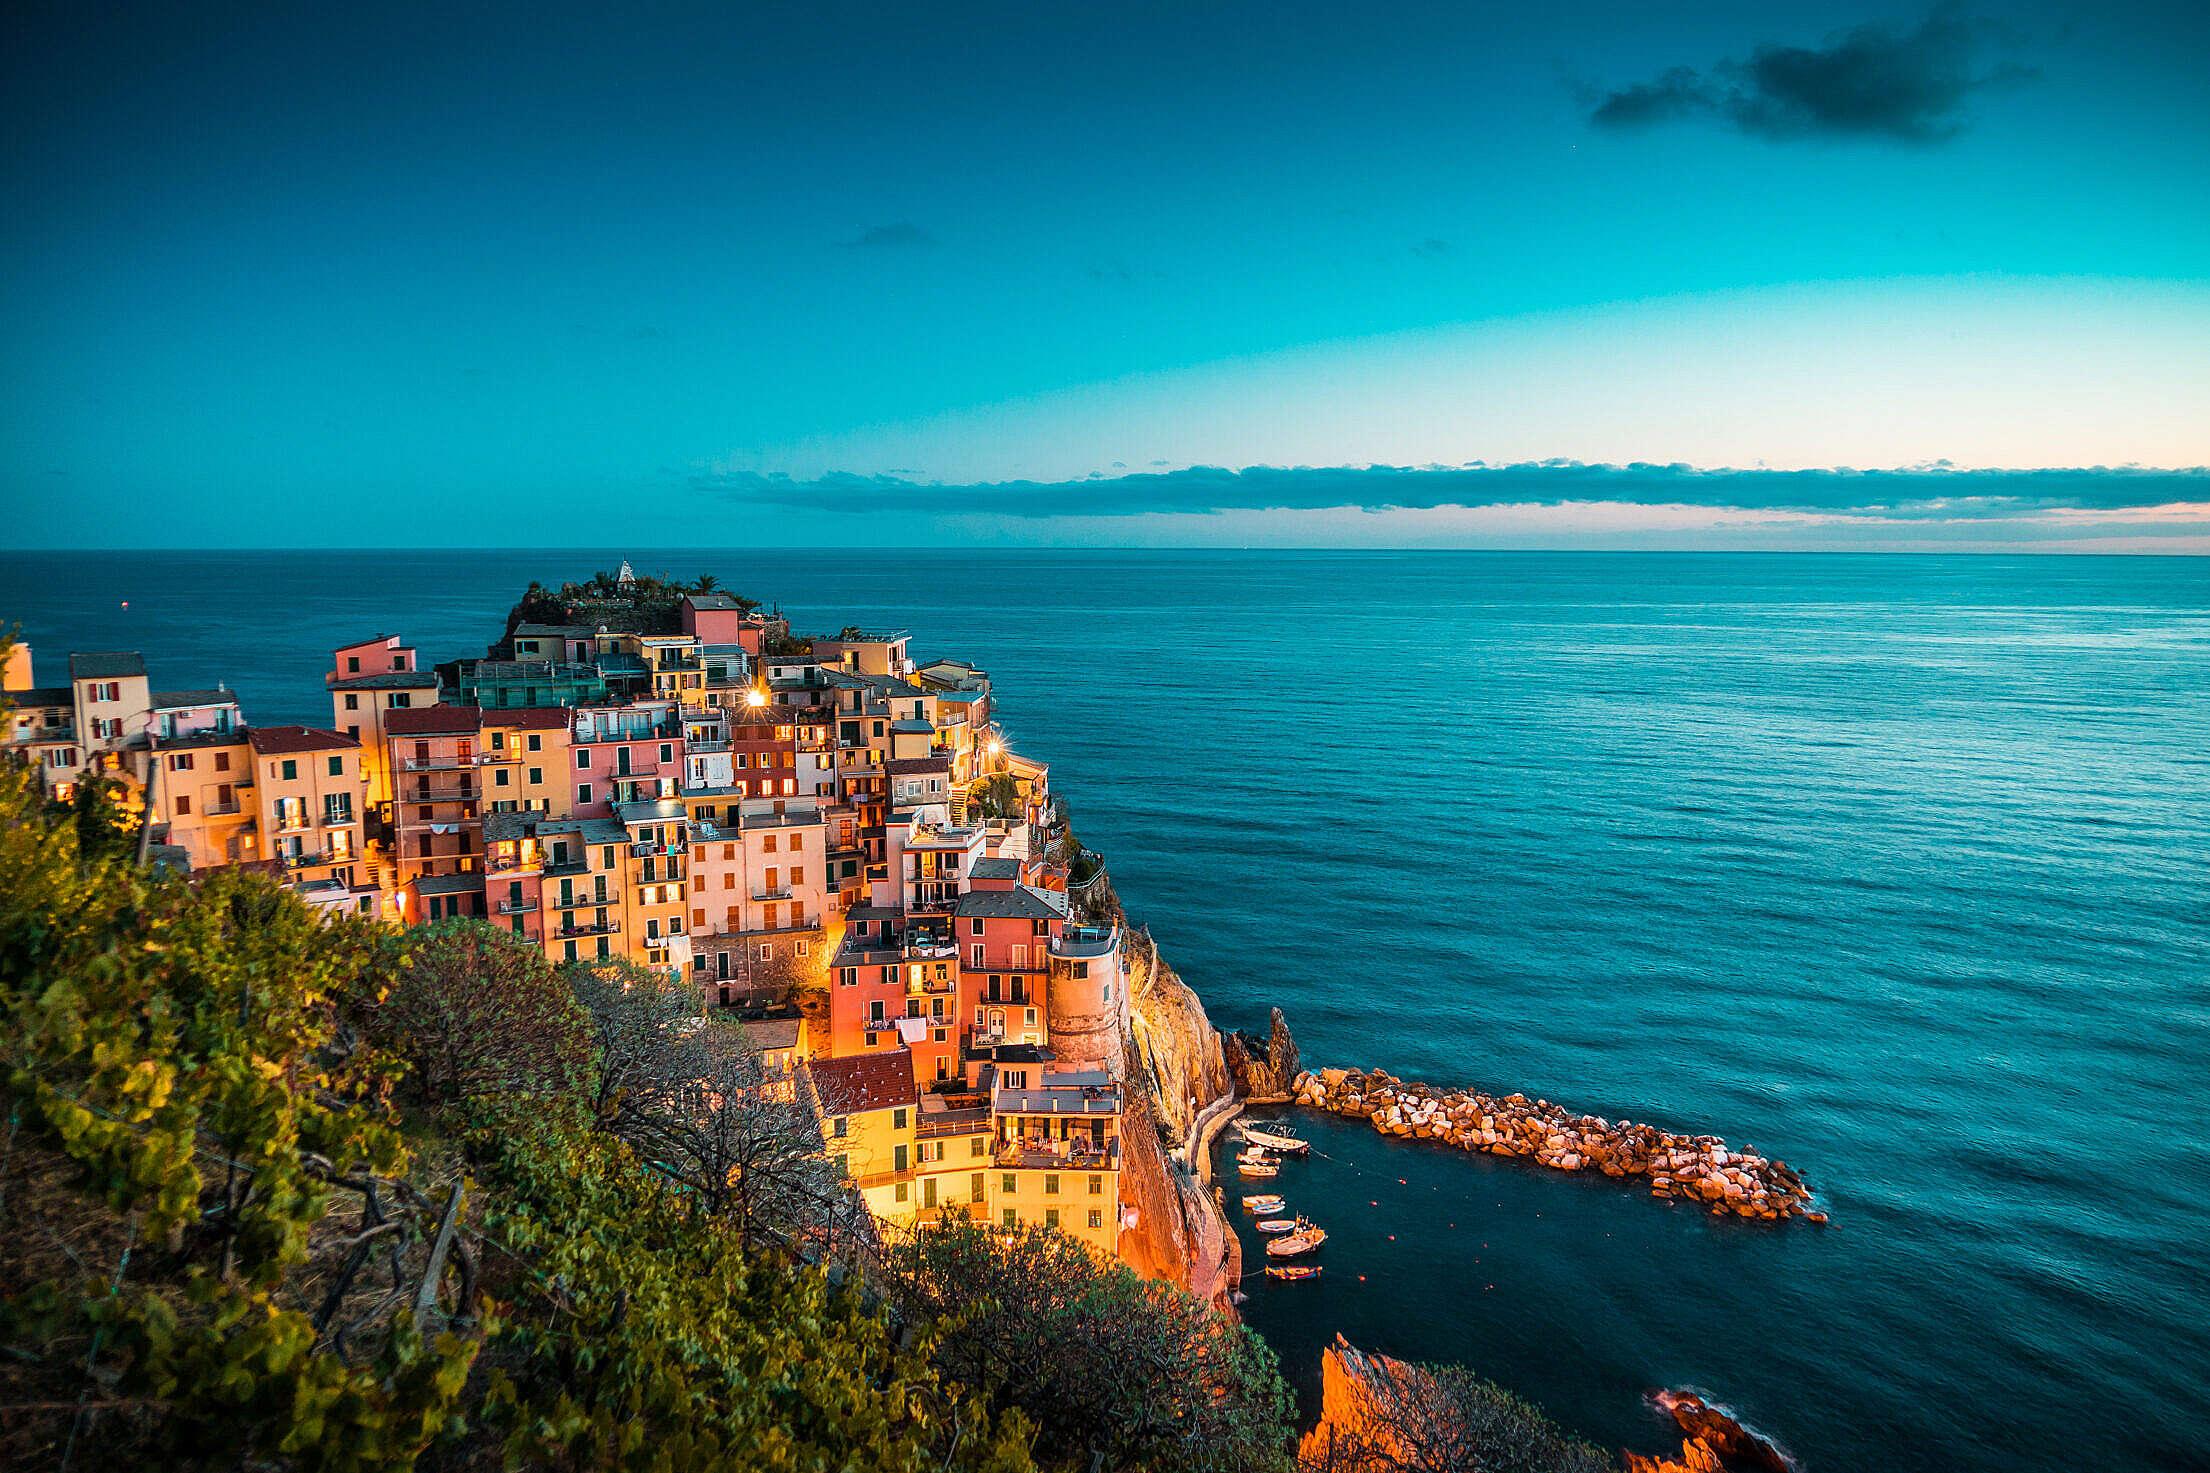 Beautiful Manarola at Night, Cinque Terre, Italy Free Stock Photo